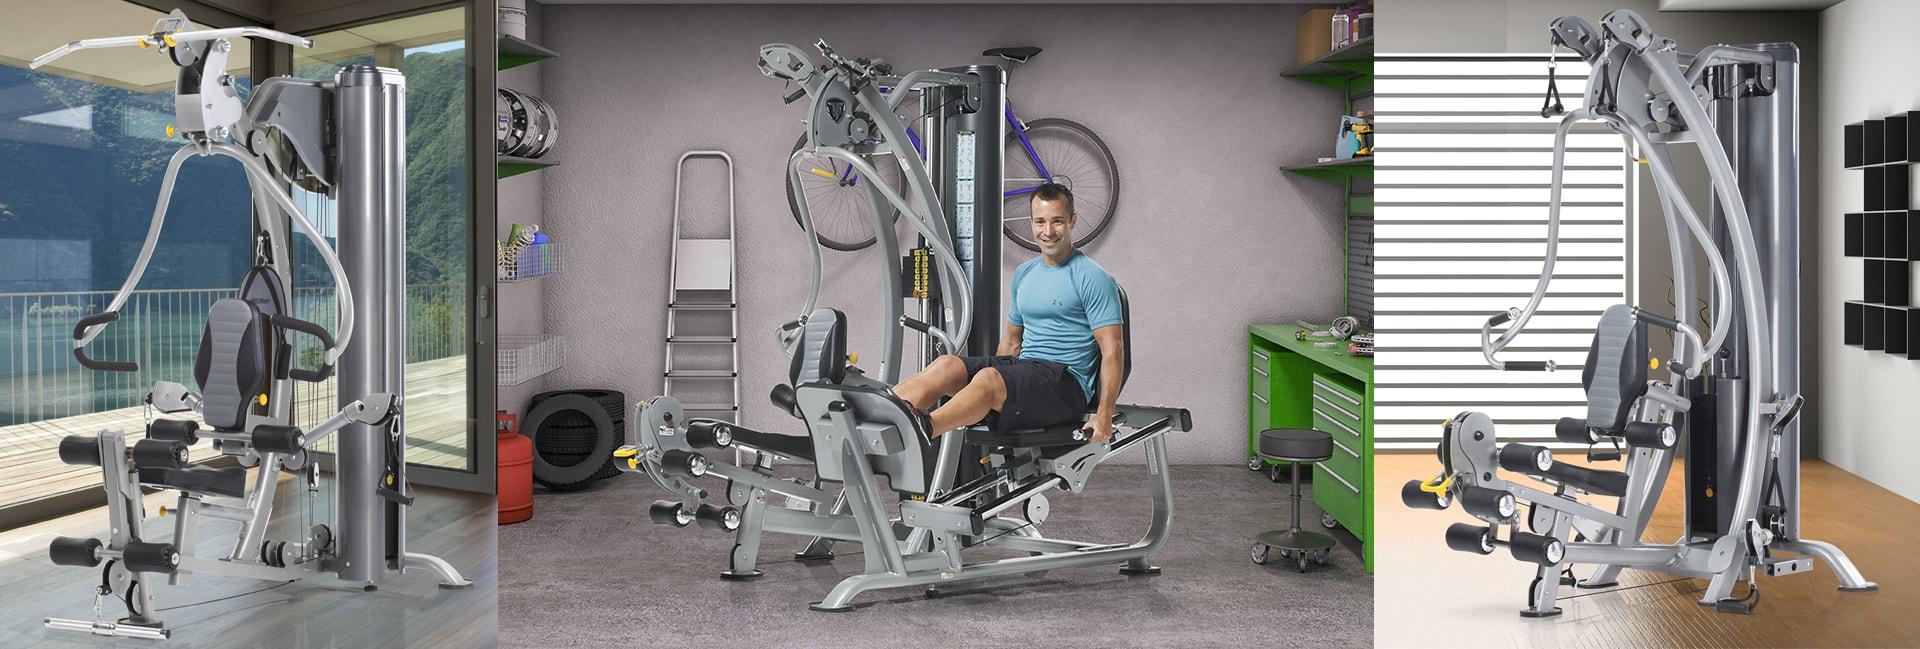 Hybrid home gym sxt tuffstuff fitness international